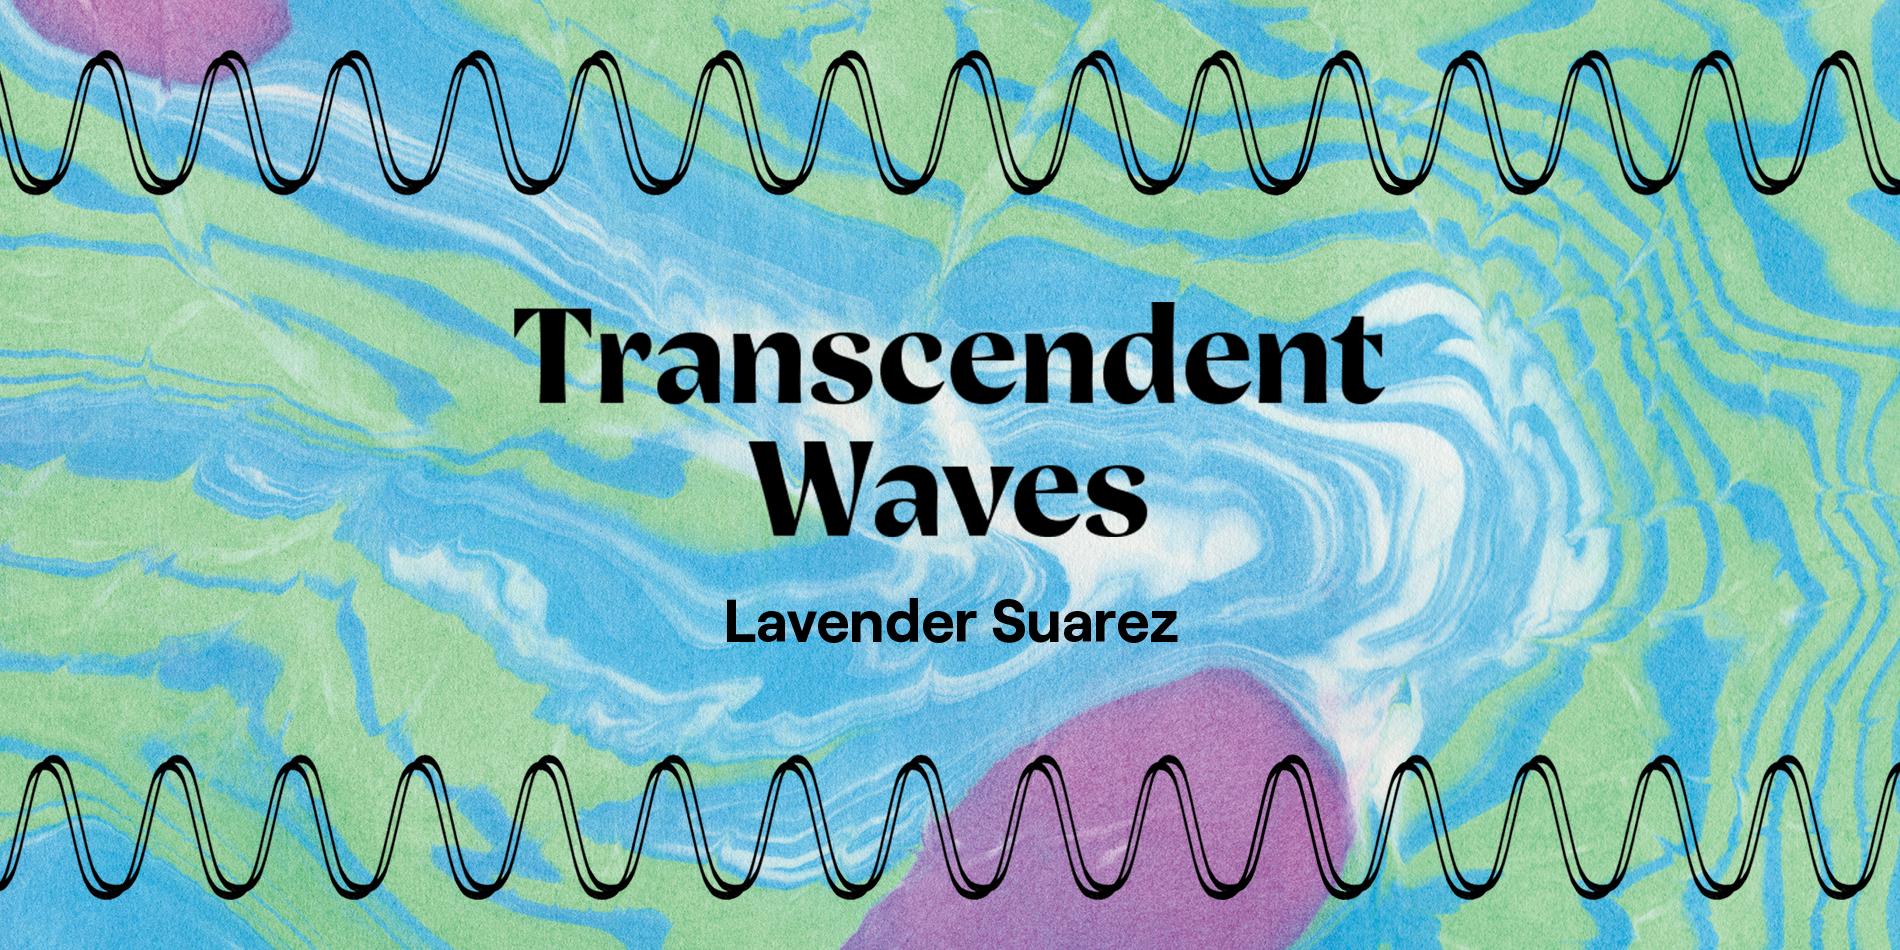 Lavender Suarez Transcendent Waves Site Banner